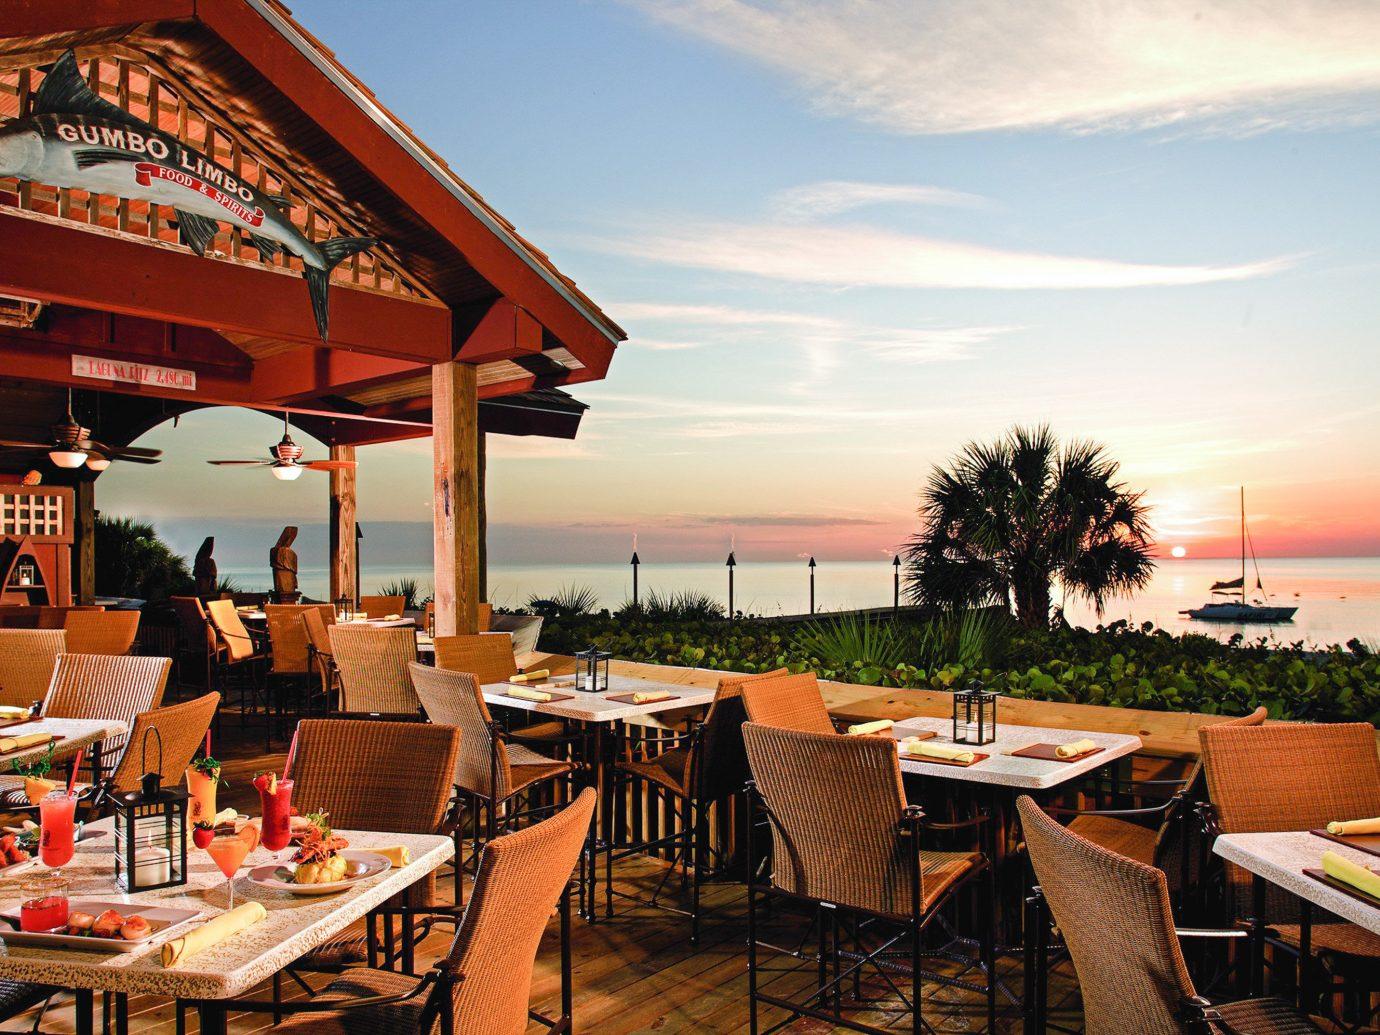 Florida Miami Trip Ideas Weekend Getaways restaurant Resort real estate